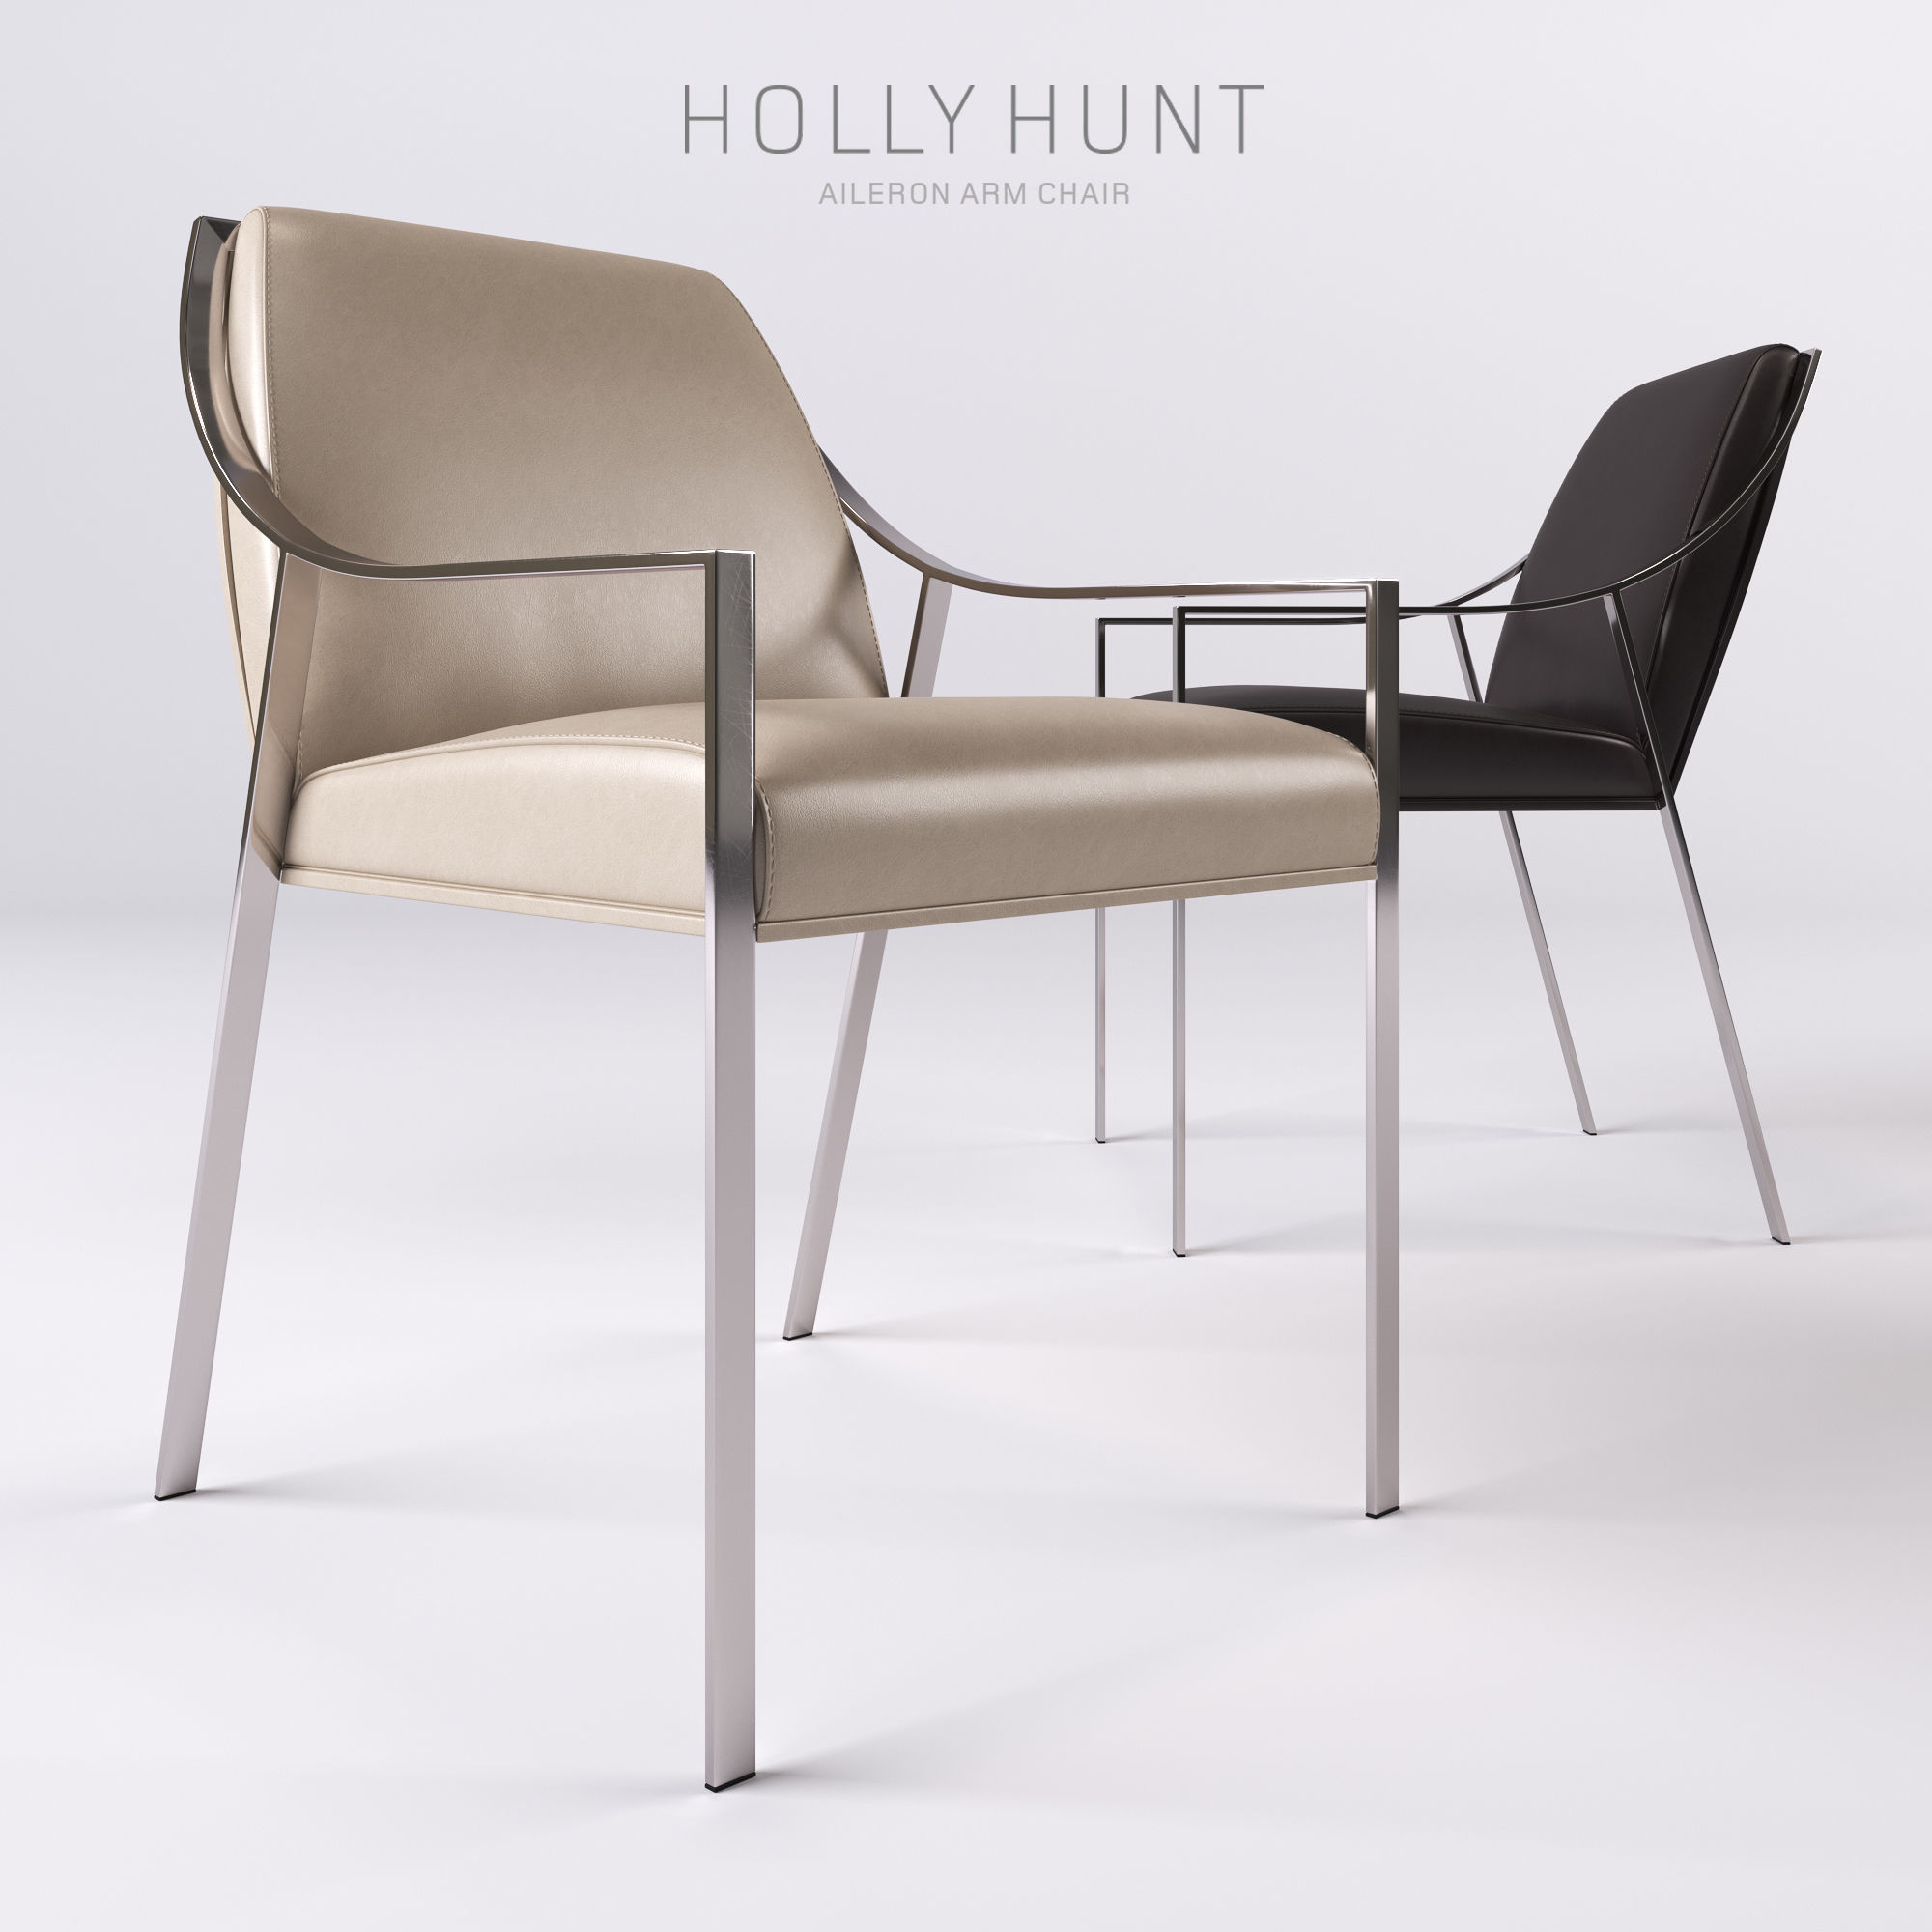 Holly Hunt Aileron Dining Arm Chair 3d Model Max Obj Fbx 1 ...